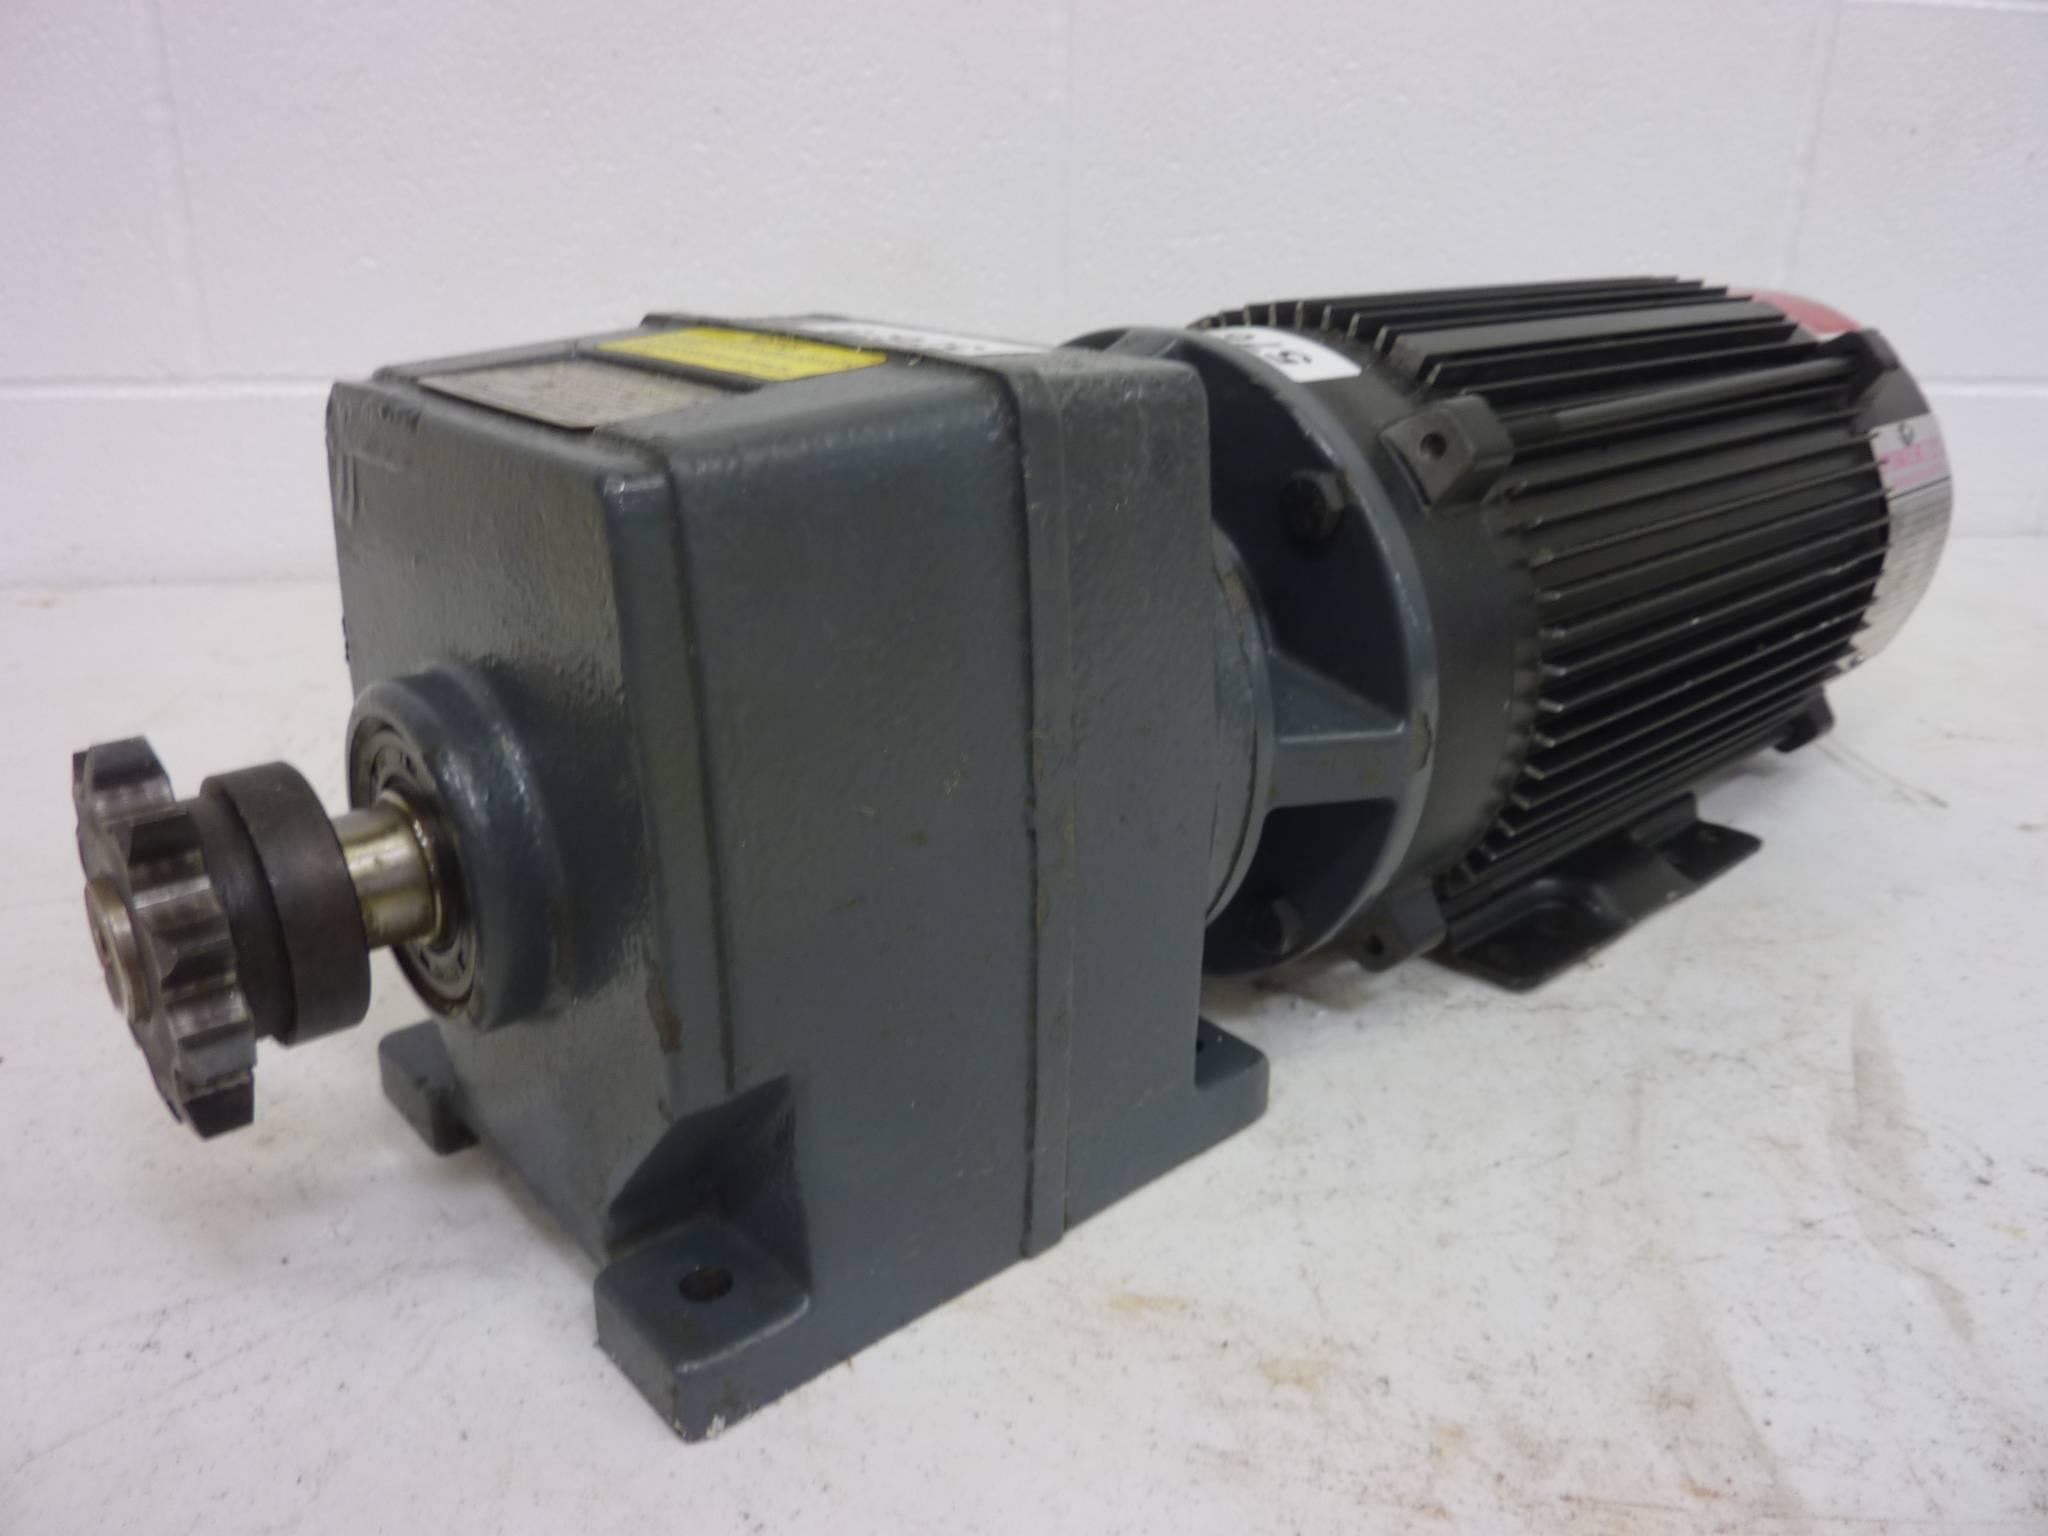 powertec 1 5 hp servo motor w gearbox l14cma1100100000